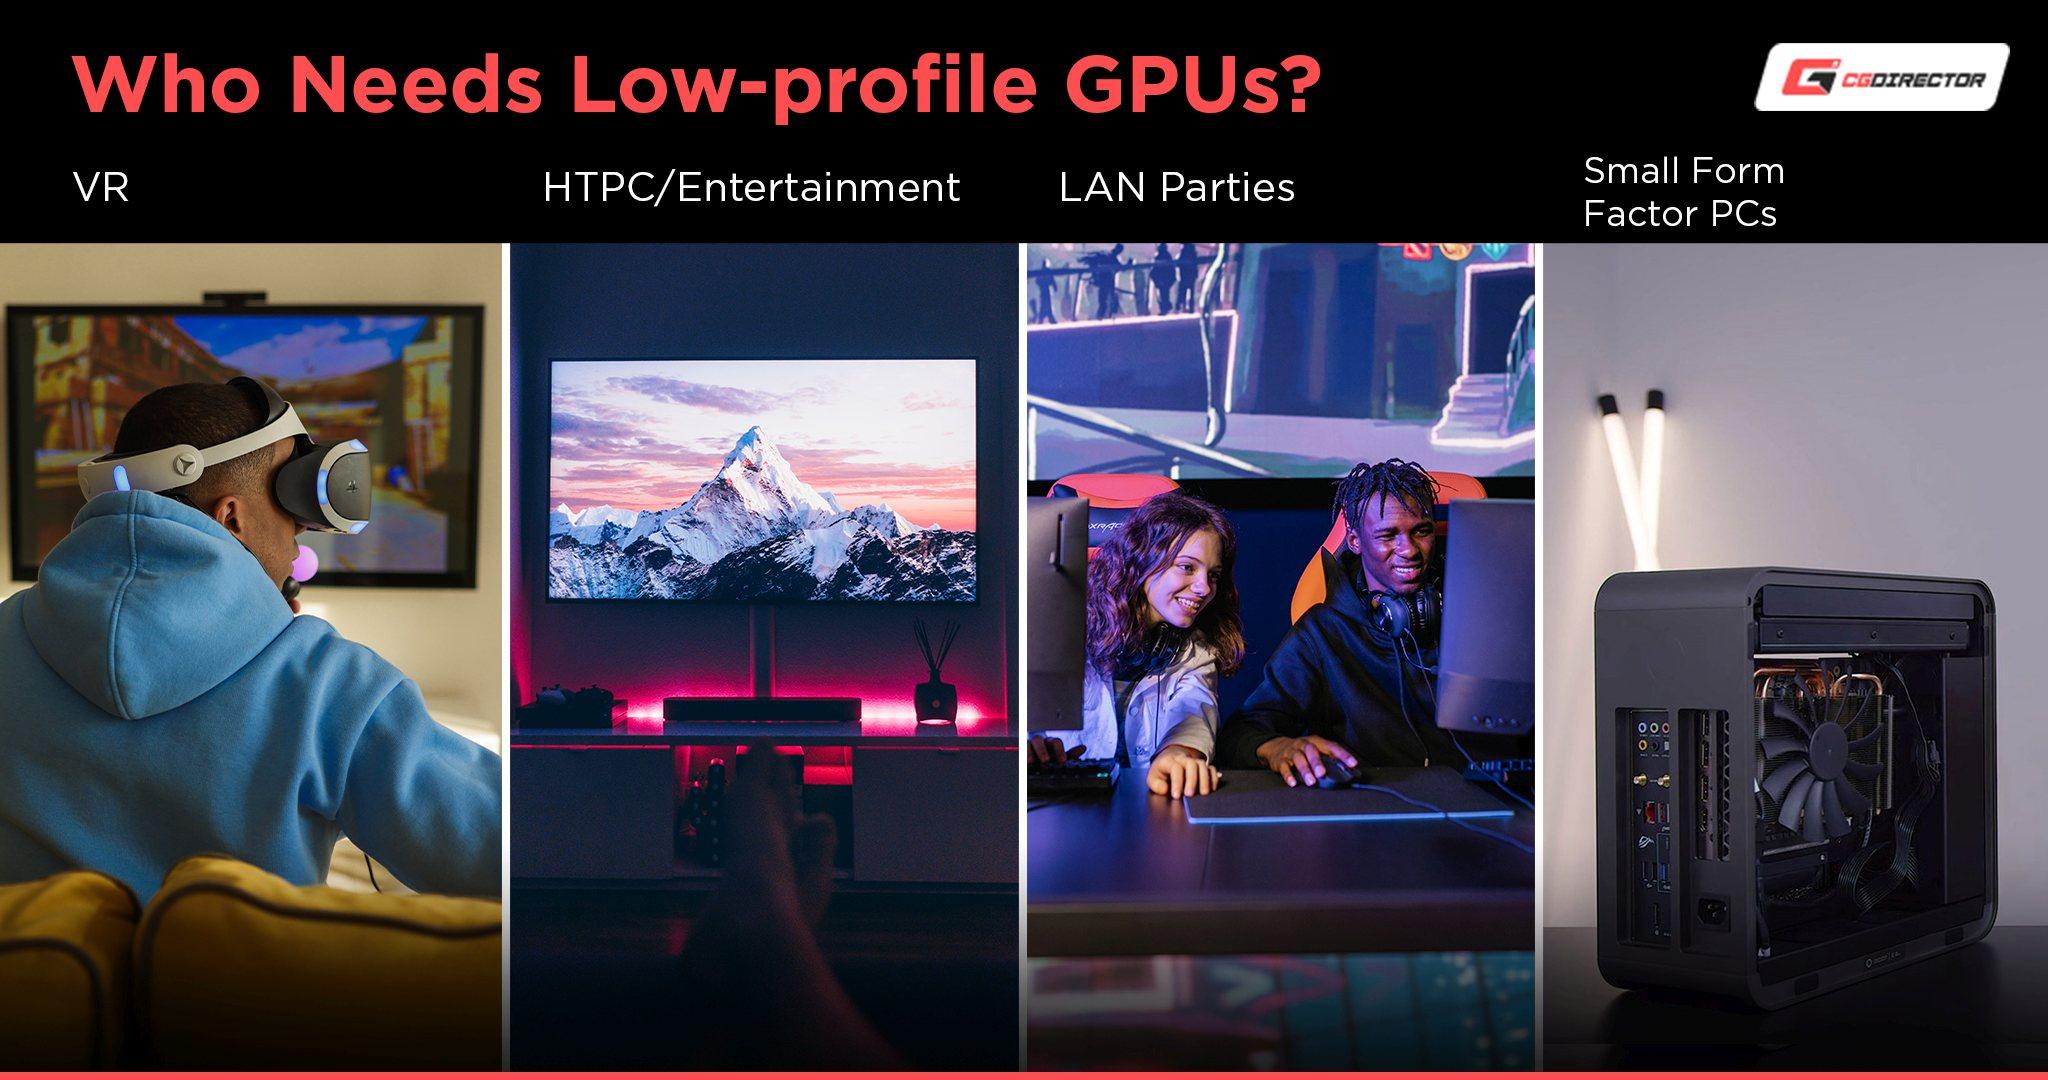 Who needs low profile GPUS